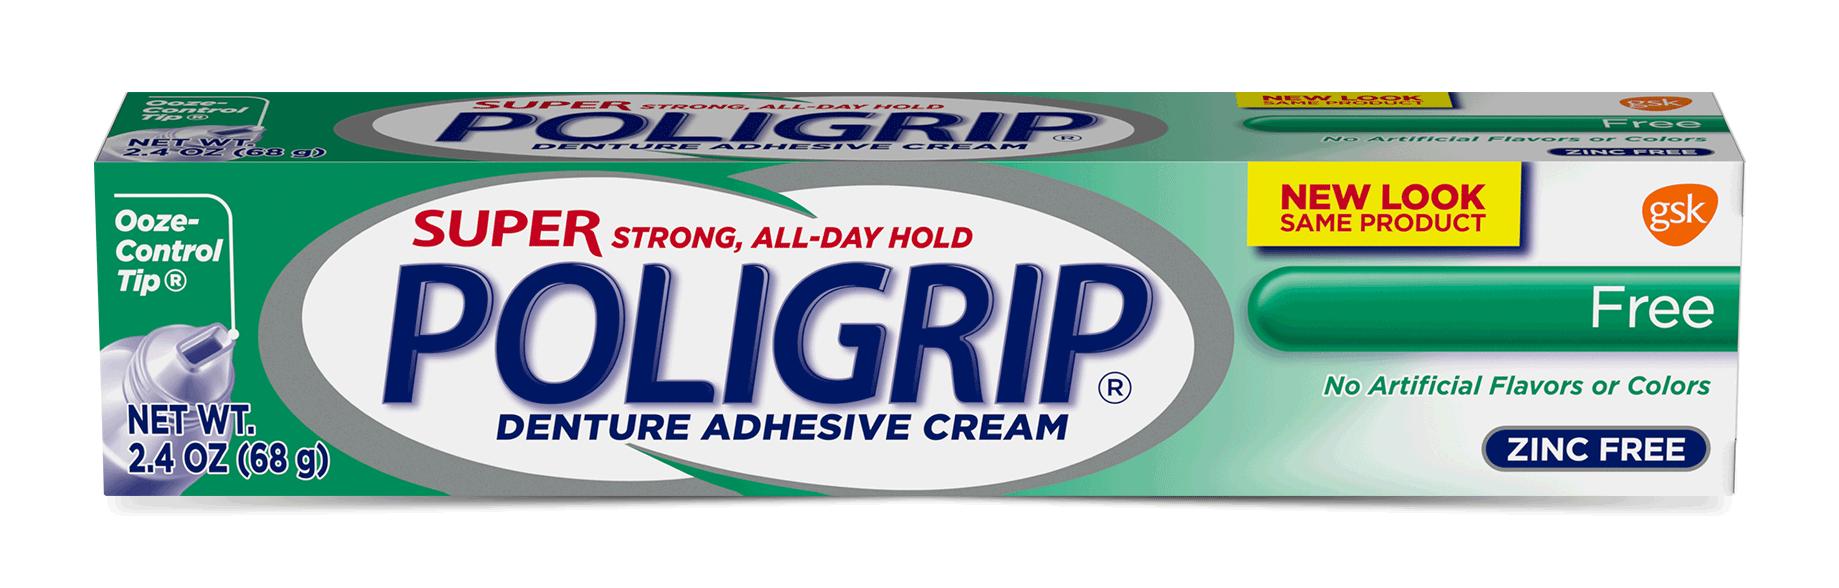 Super Poligrip® Free Denture Adhesive | MyDentureCare